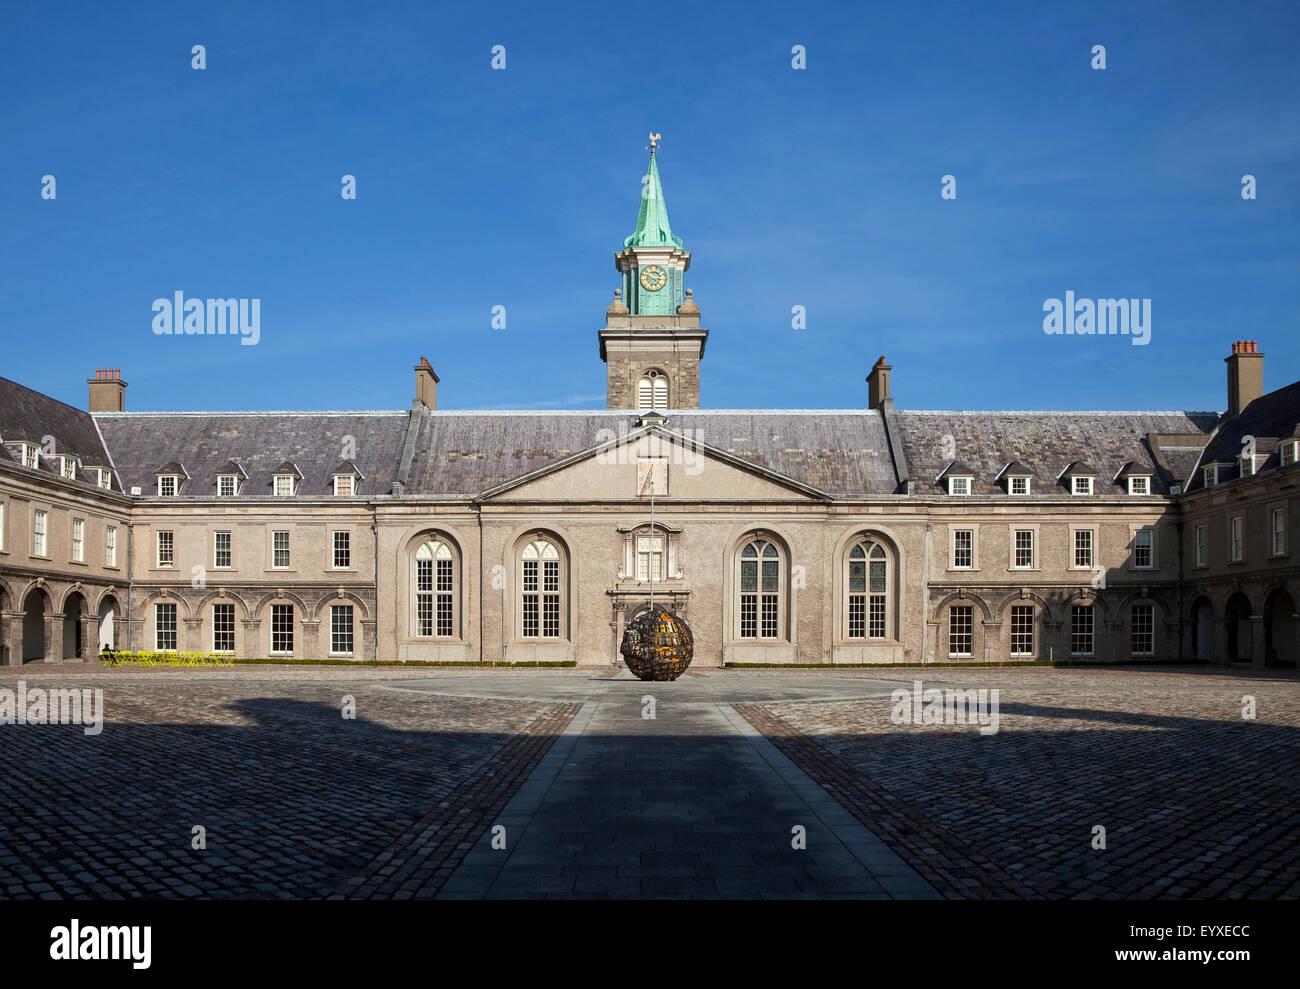 The Royal Hospital Kilmainham, built in 1684 by Sir William Robinson, now the Museum of Modern Art (IMMA), Kilmainham, - Stock Image